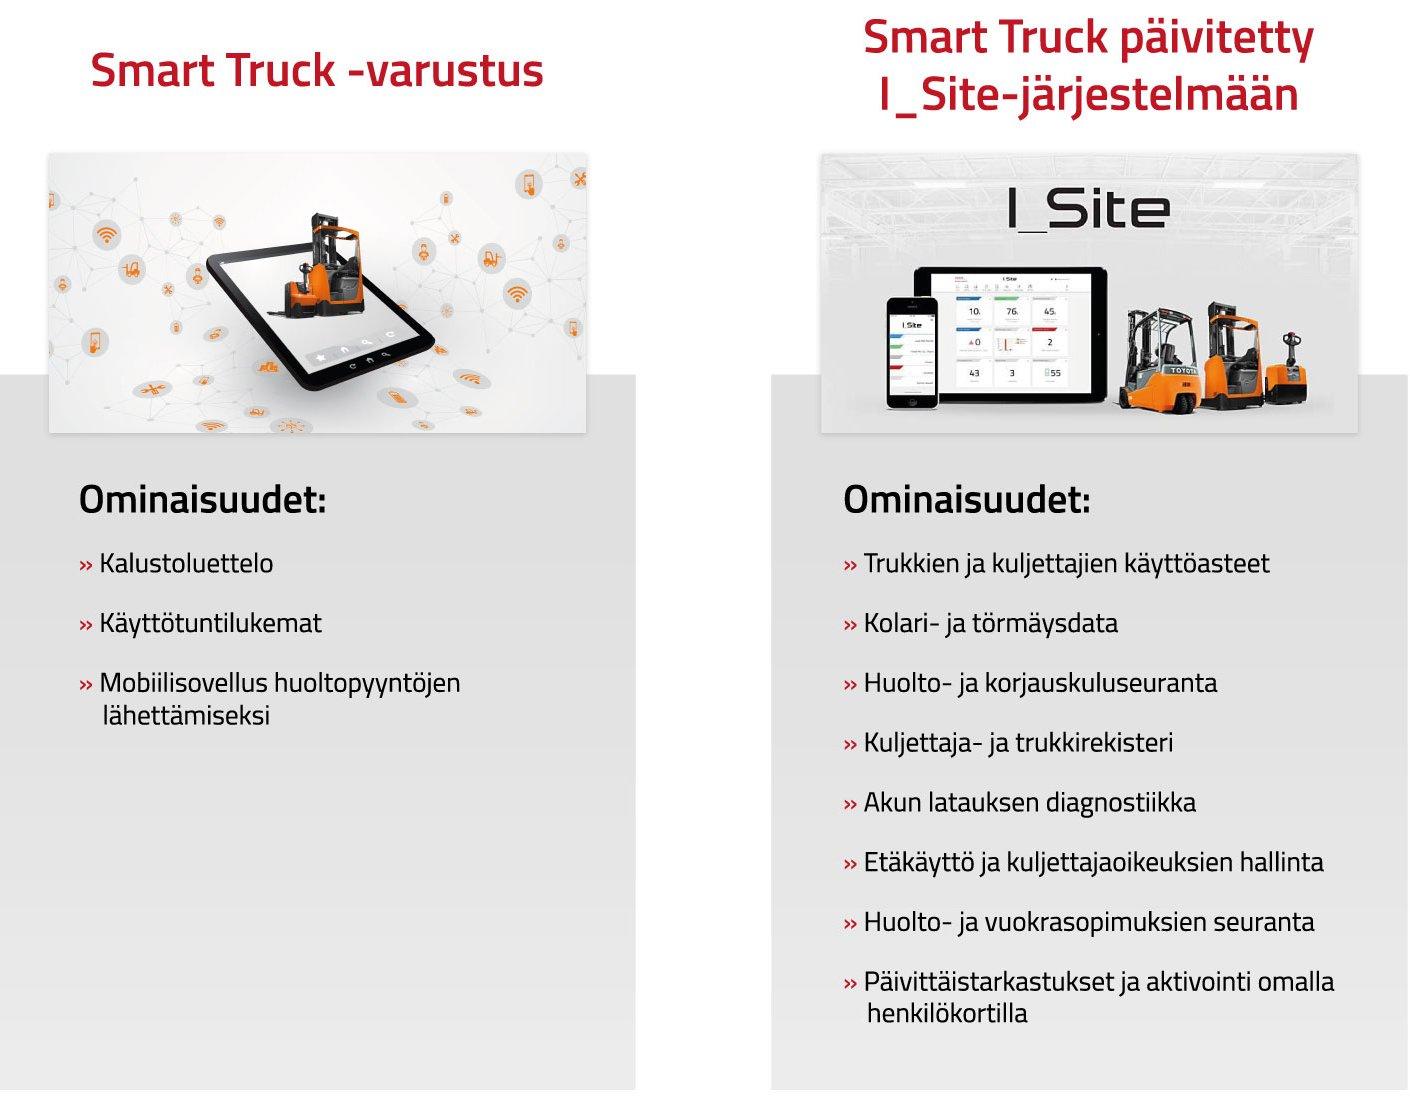 Smart Truck vs. Smart Truck + I_Site